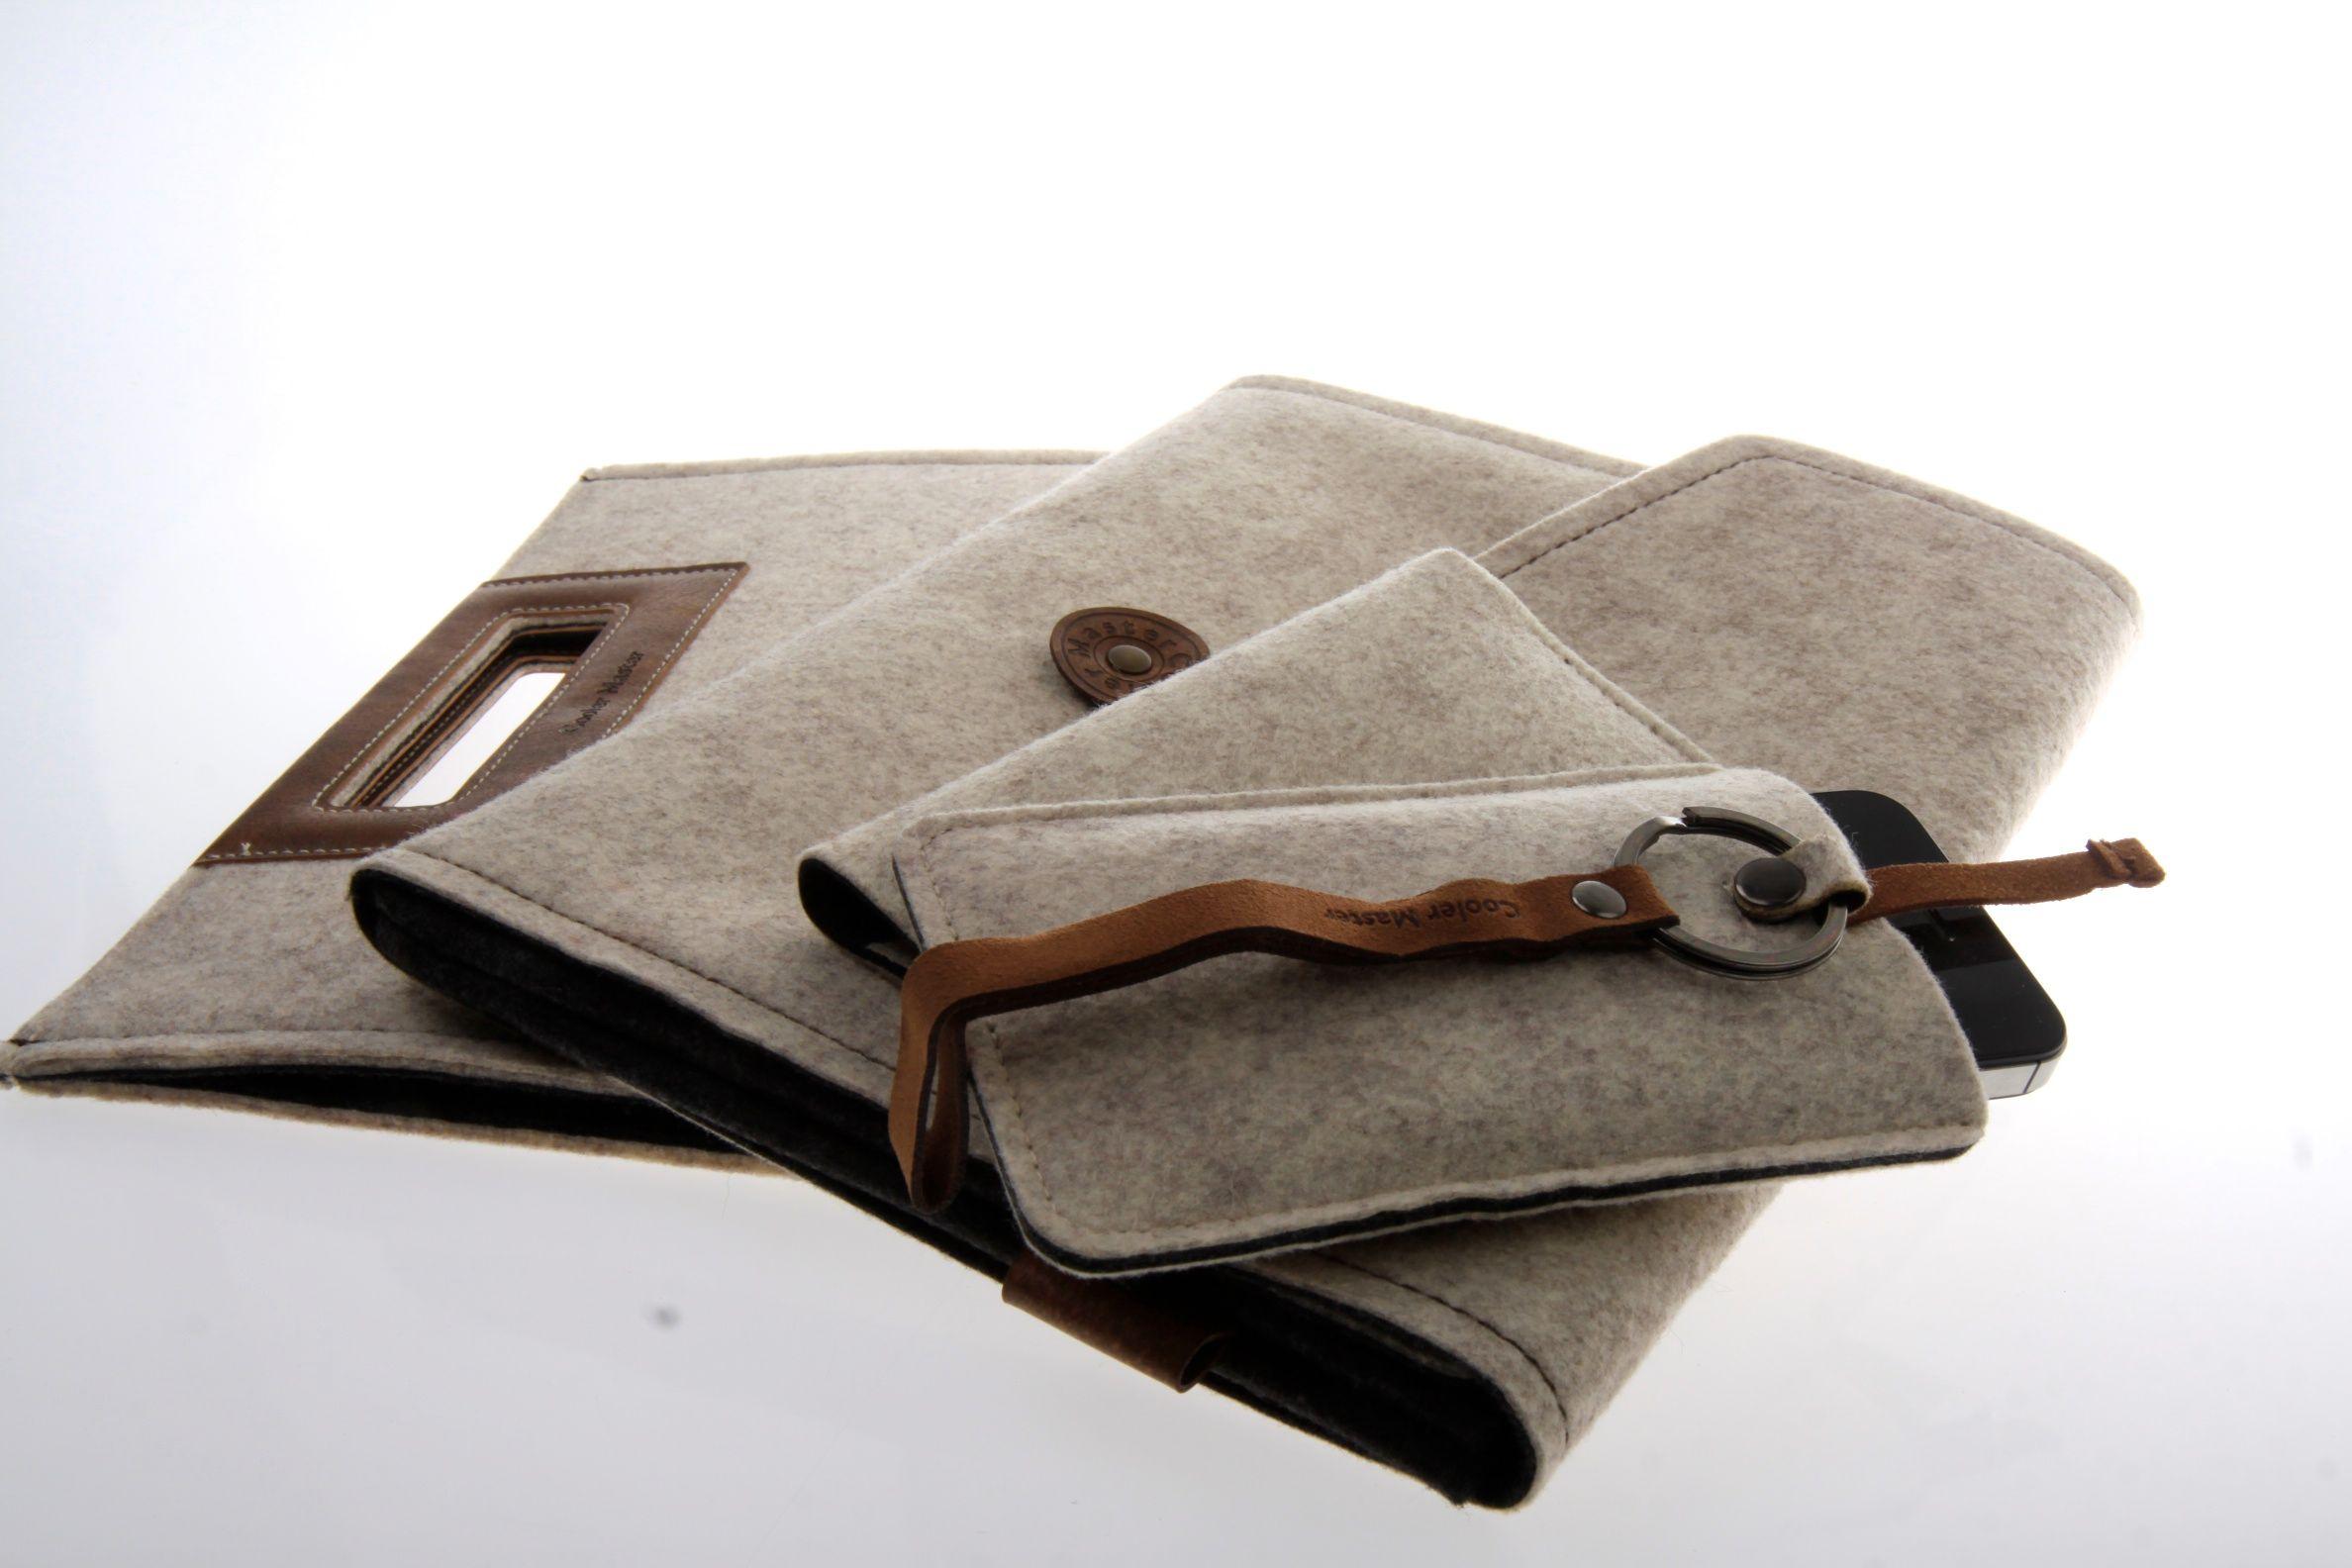 Cooler Master Elegance Collection. Fra venstre: Afrino Folio, Cormo Sleeve, Exmoor Folio og Dorset Pouch.Foto: Kurt Lekanger, Amobil.no